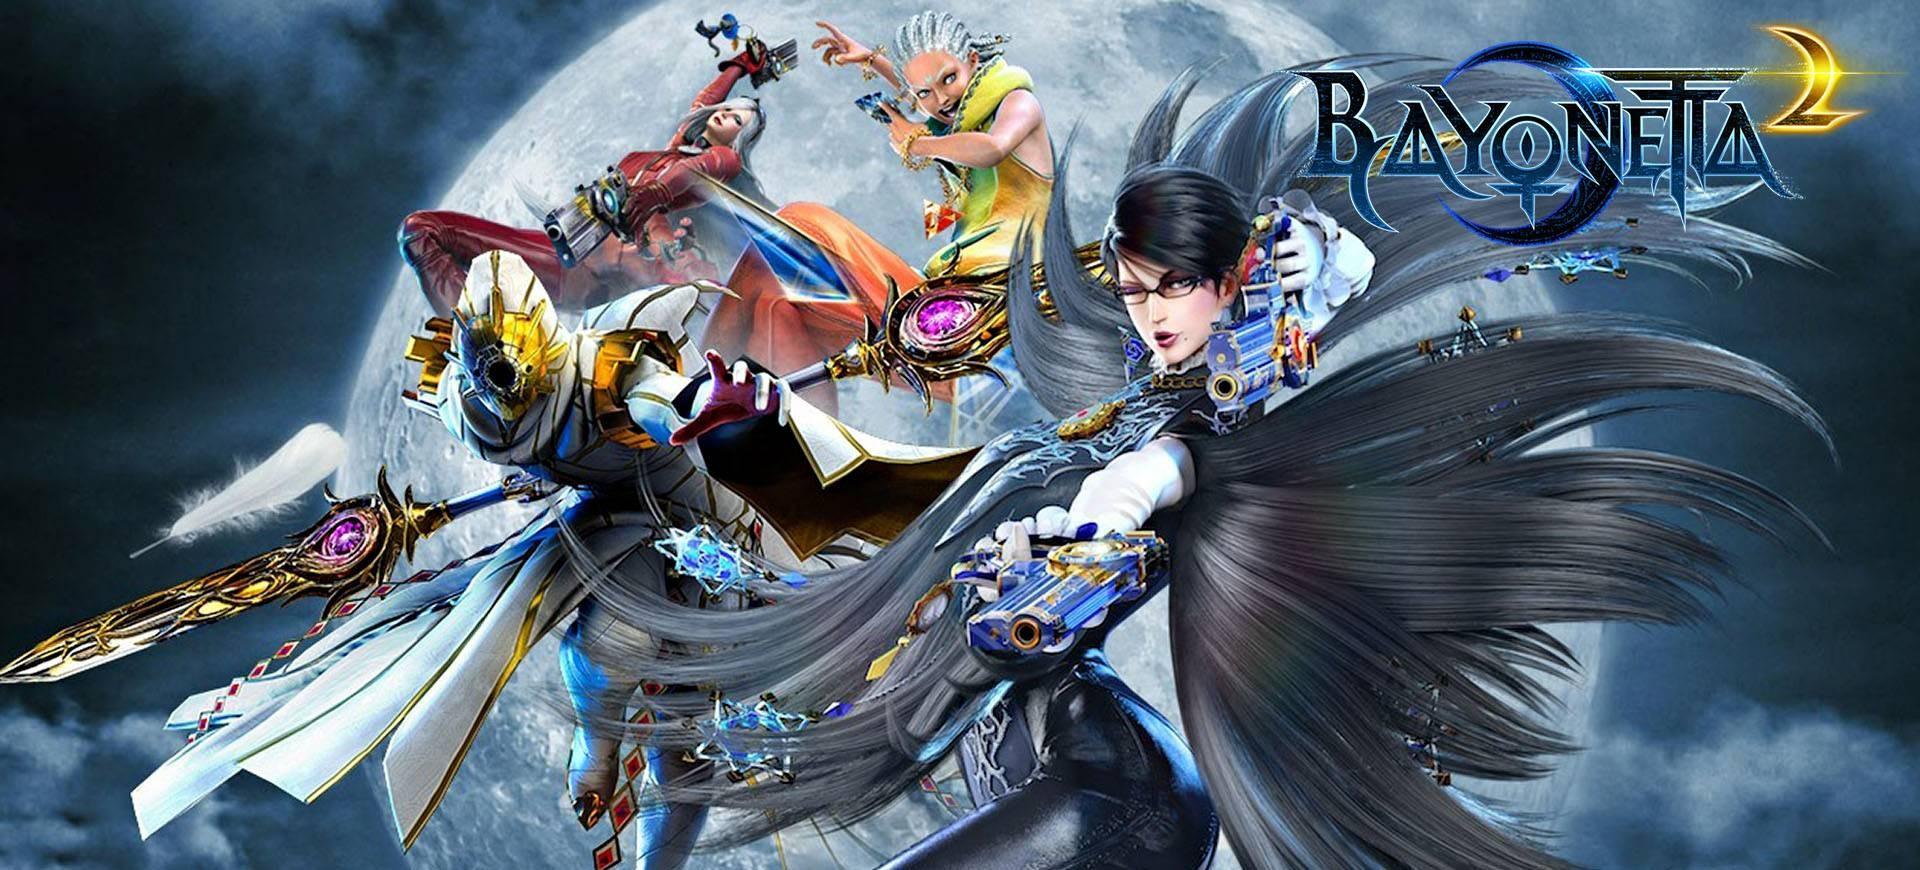 Bayonetta 2 - Đánh Giá Game